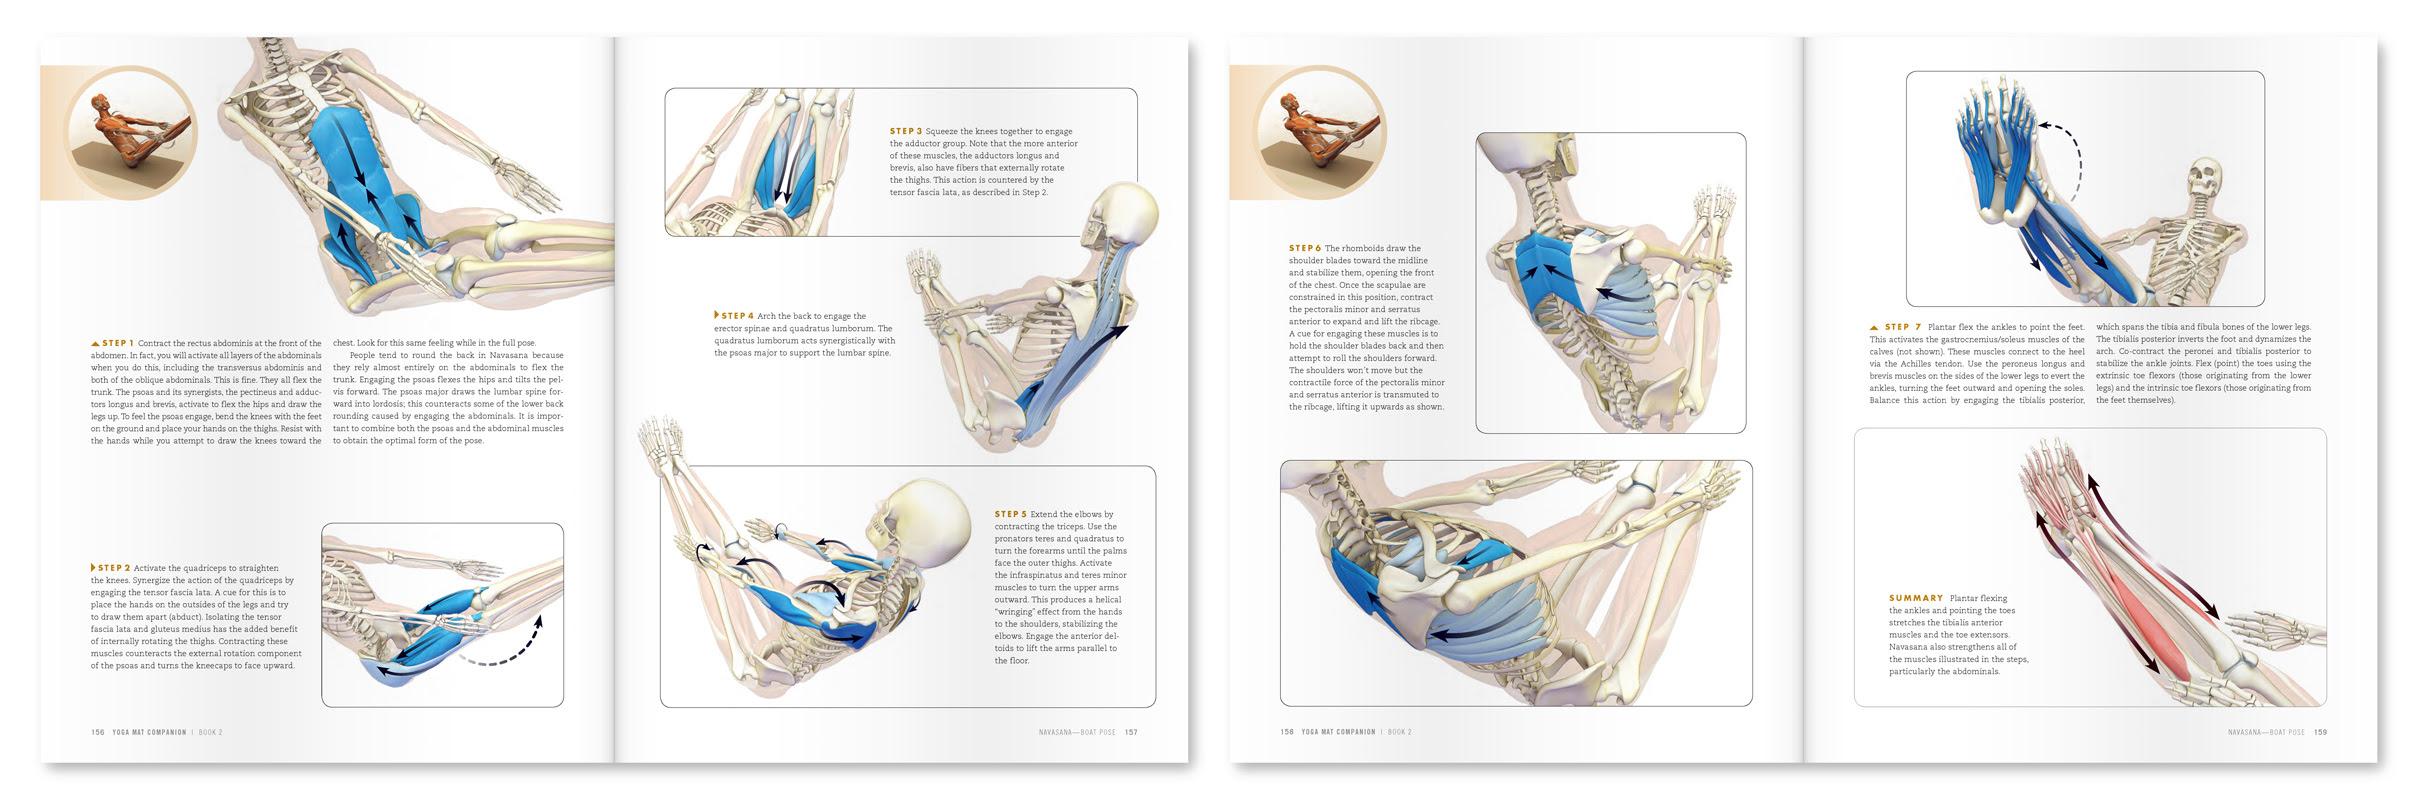 Navasana Anatomy